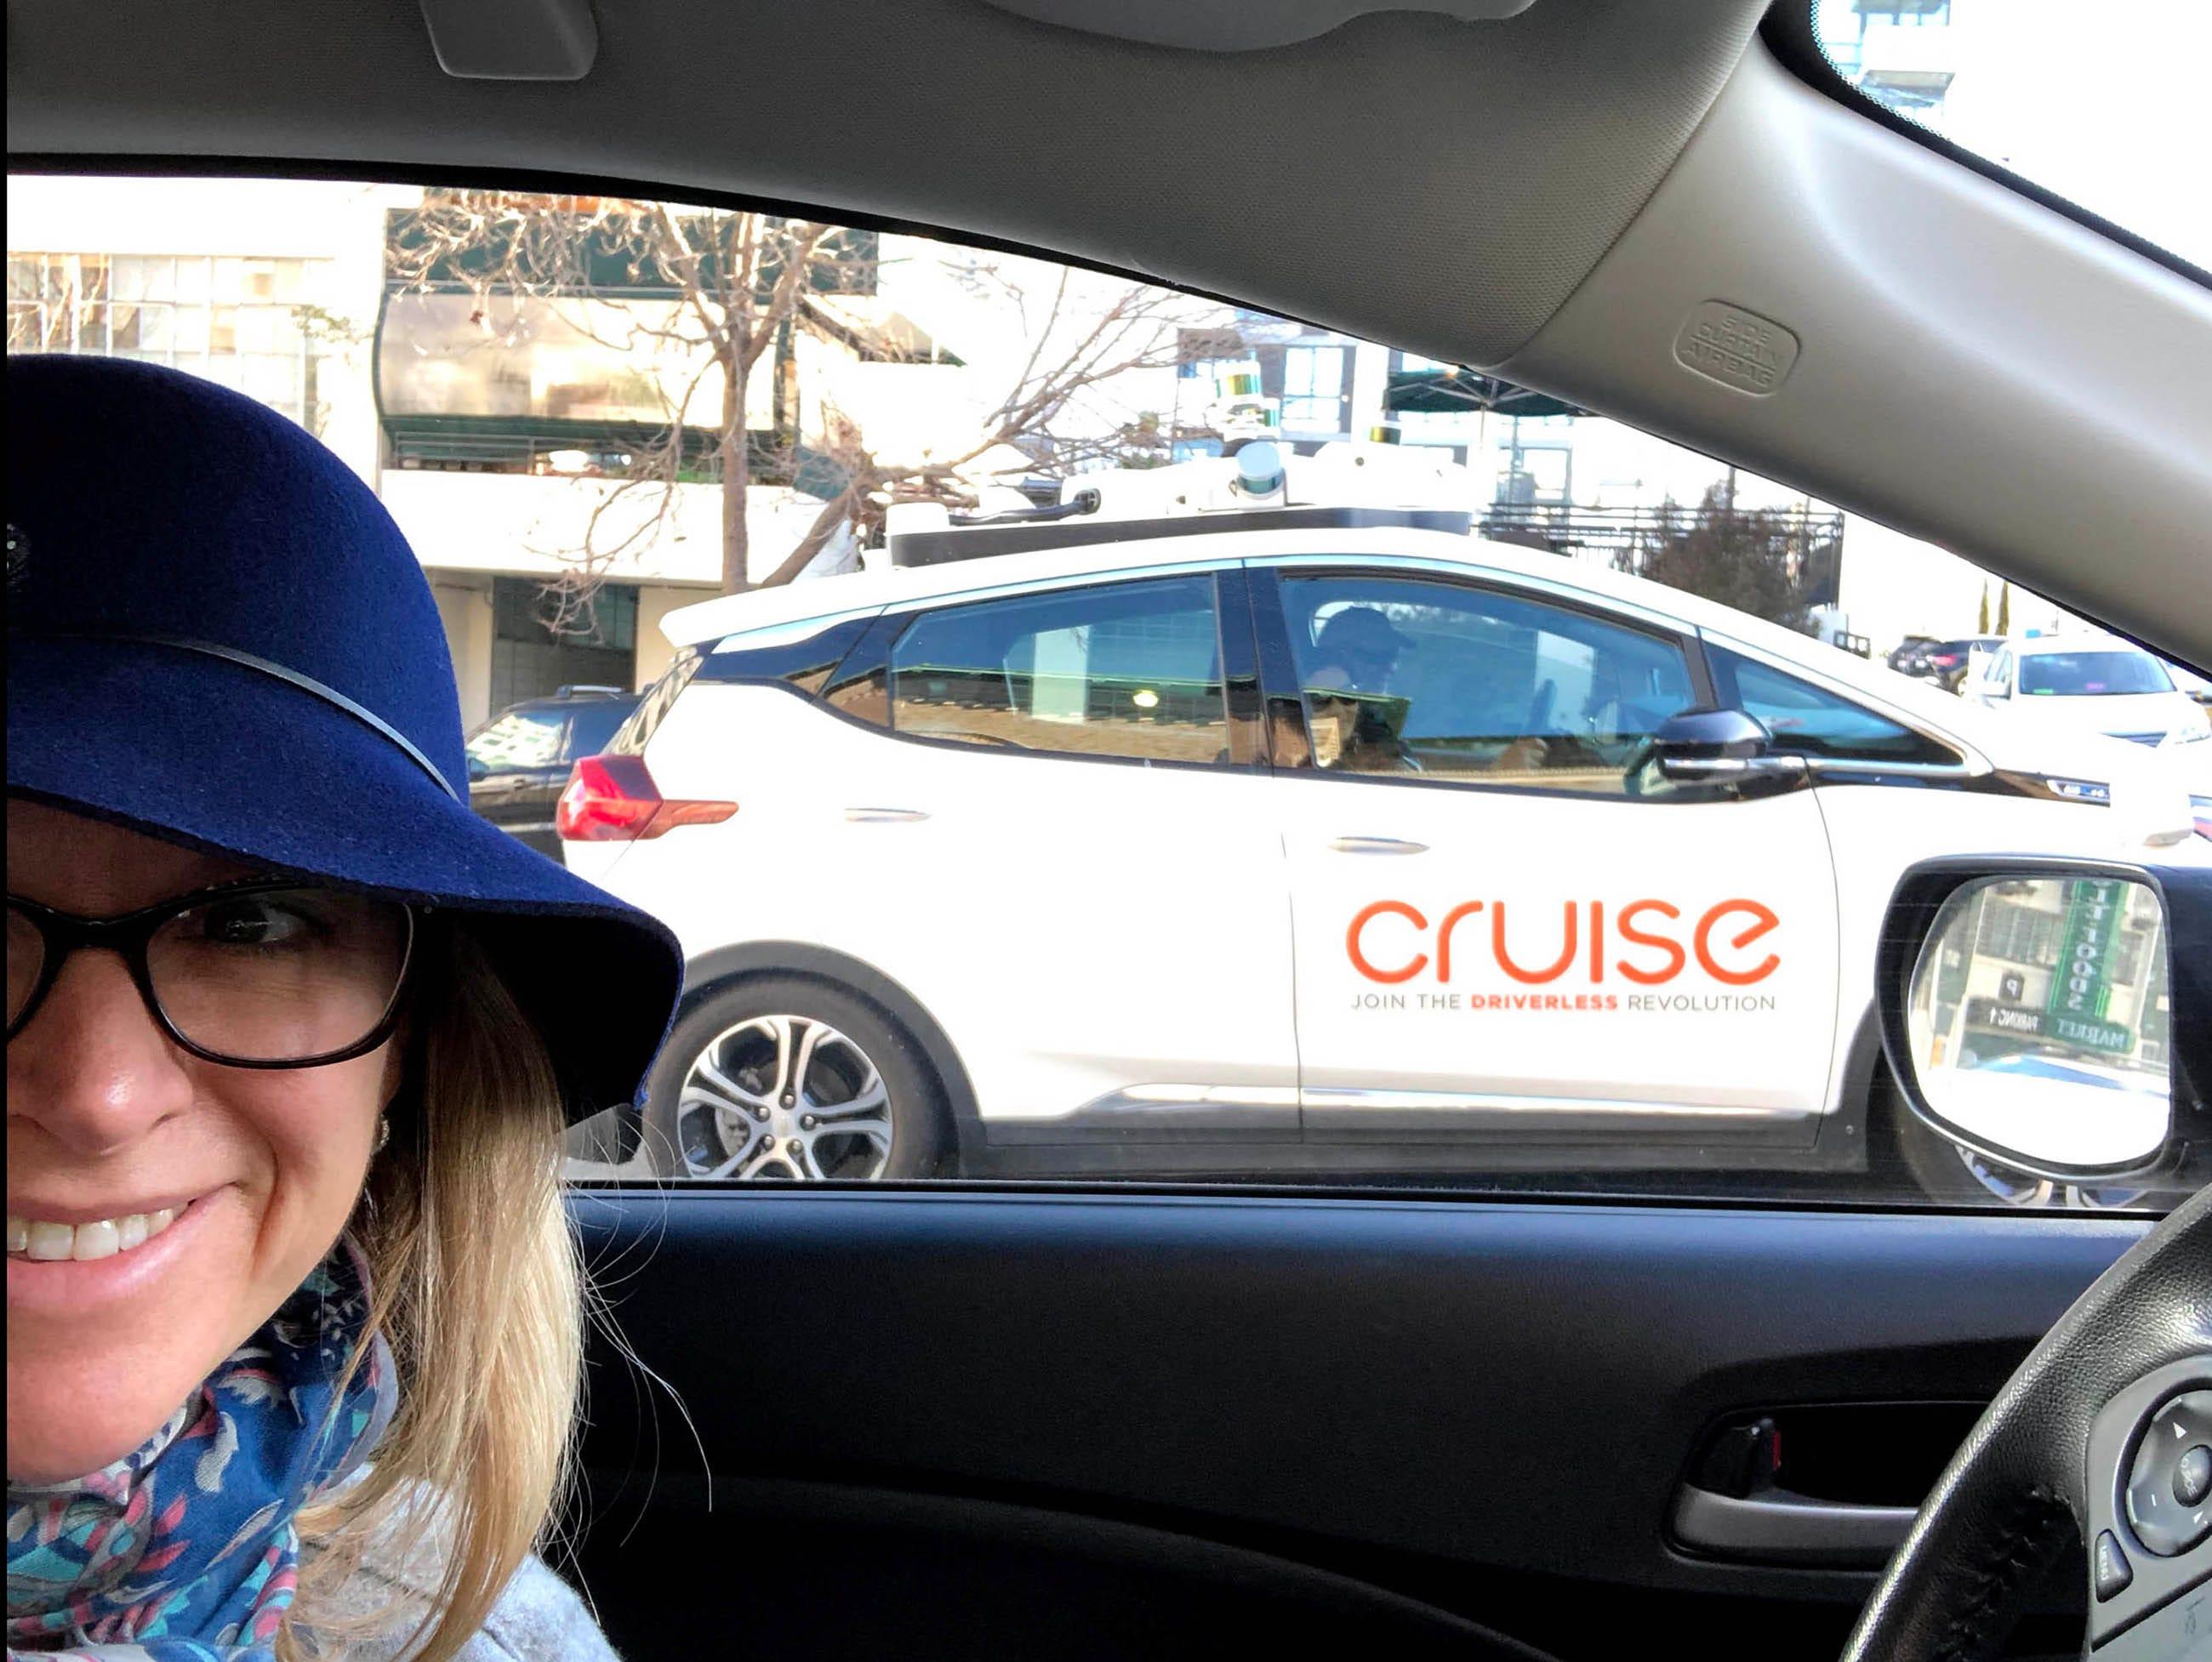 freep.com - Jamie L. LaReau, Detroit Free Press - How General Motors is leading the race for self-driving cars